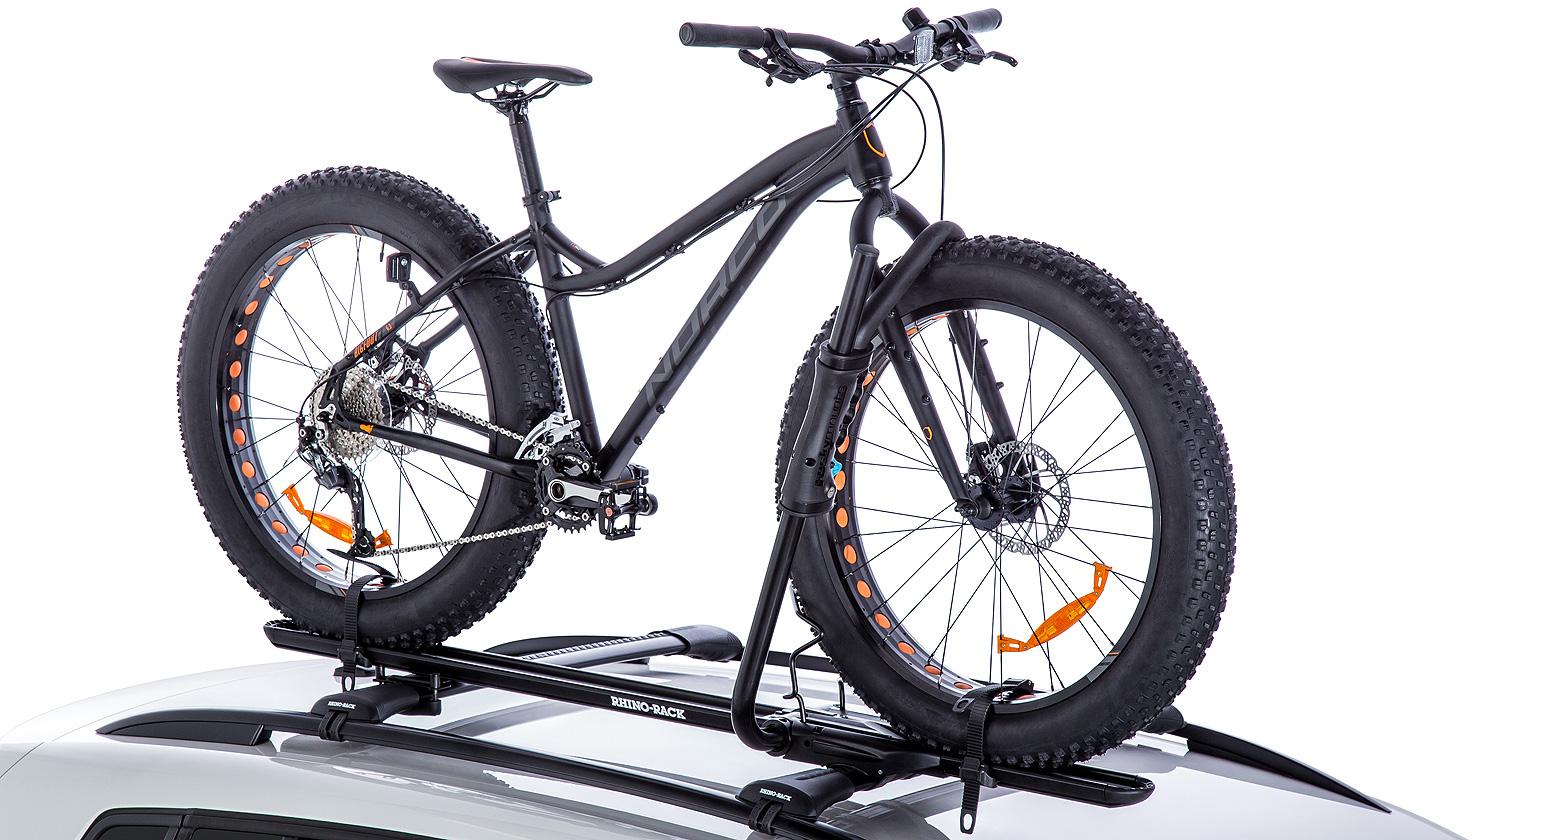 Rbca033 Fat Bike Adapter Kit Suits Rbc050 Rhino Rack